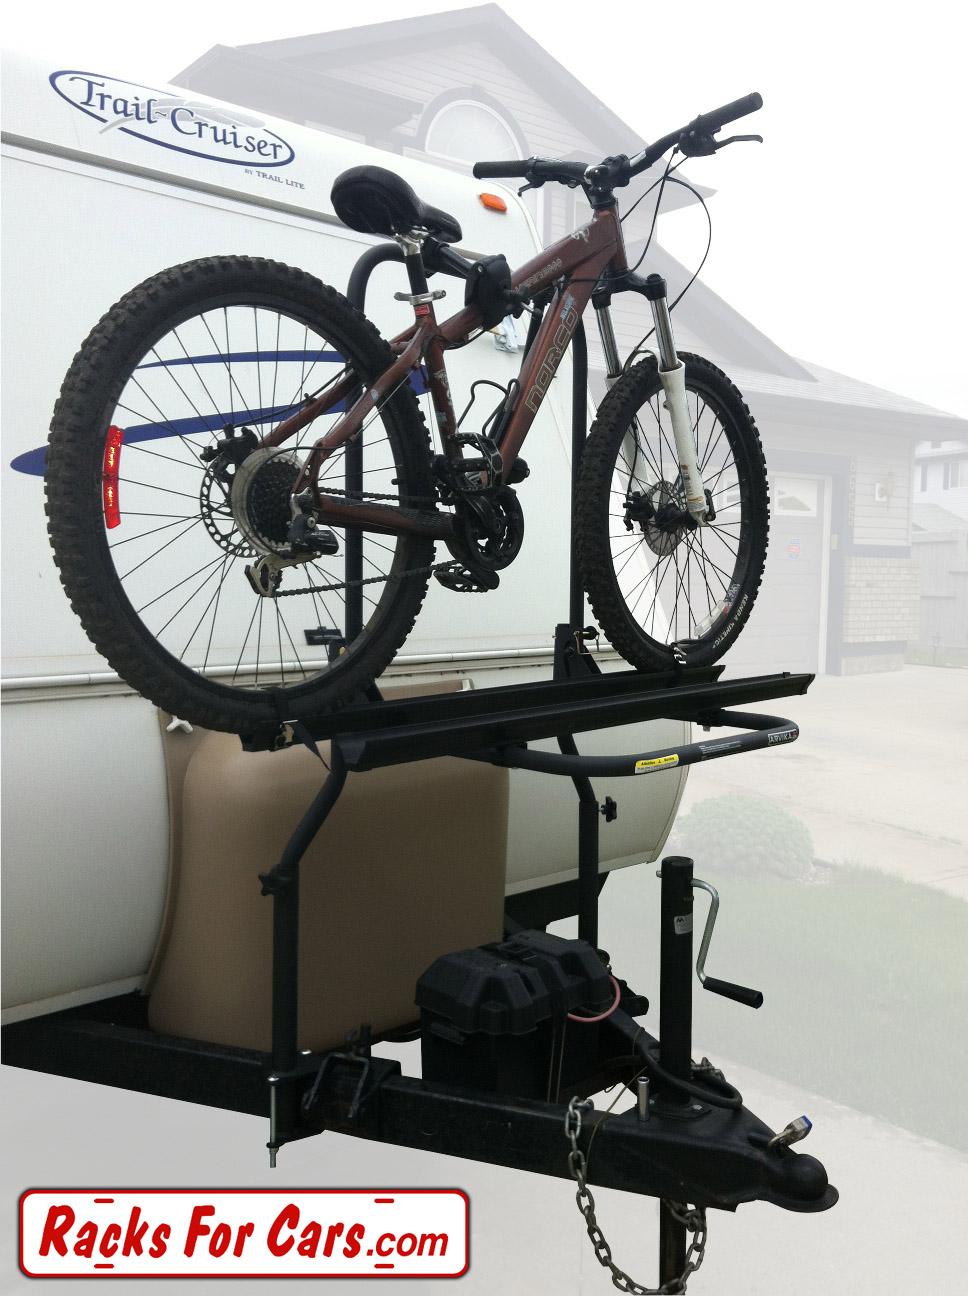 Tow Hitch Bike Rack >> Arvika RV Bike Racks carry your bicycles on RVs and fifth wheels - RacksForCars.com